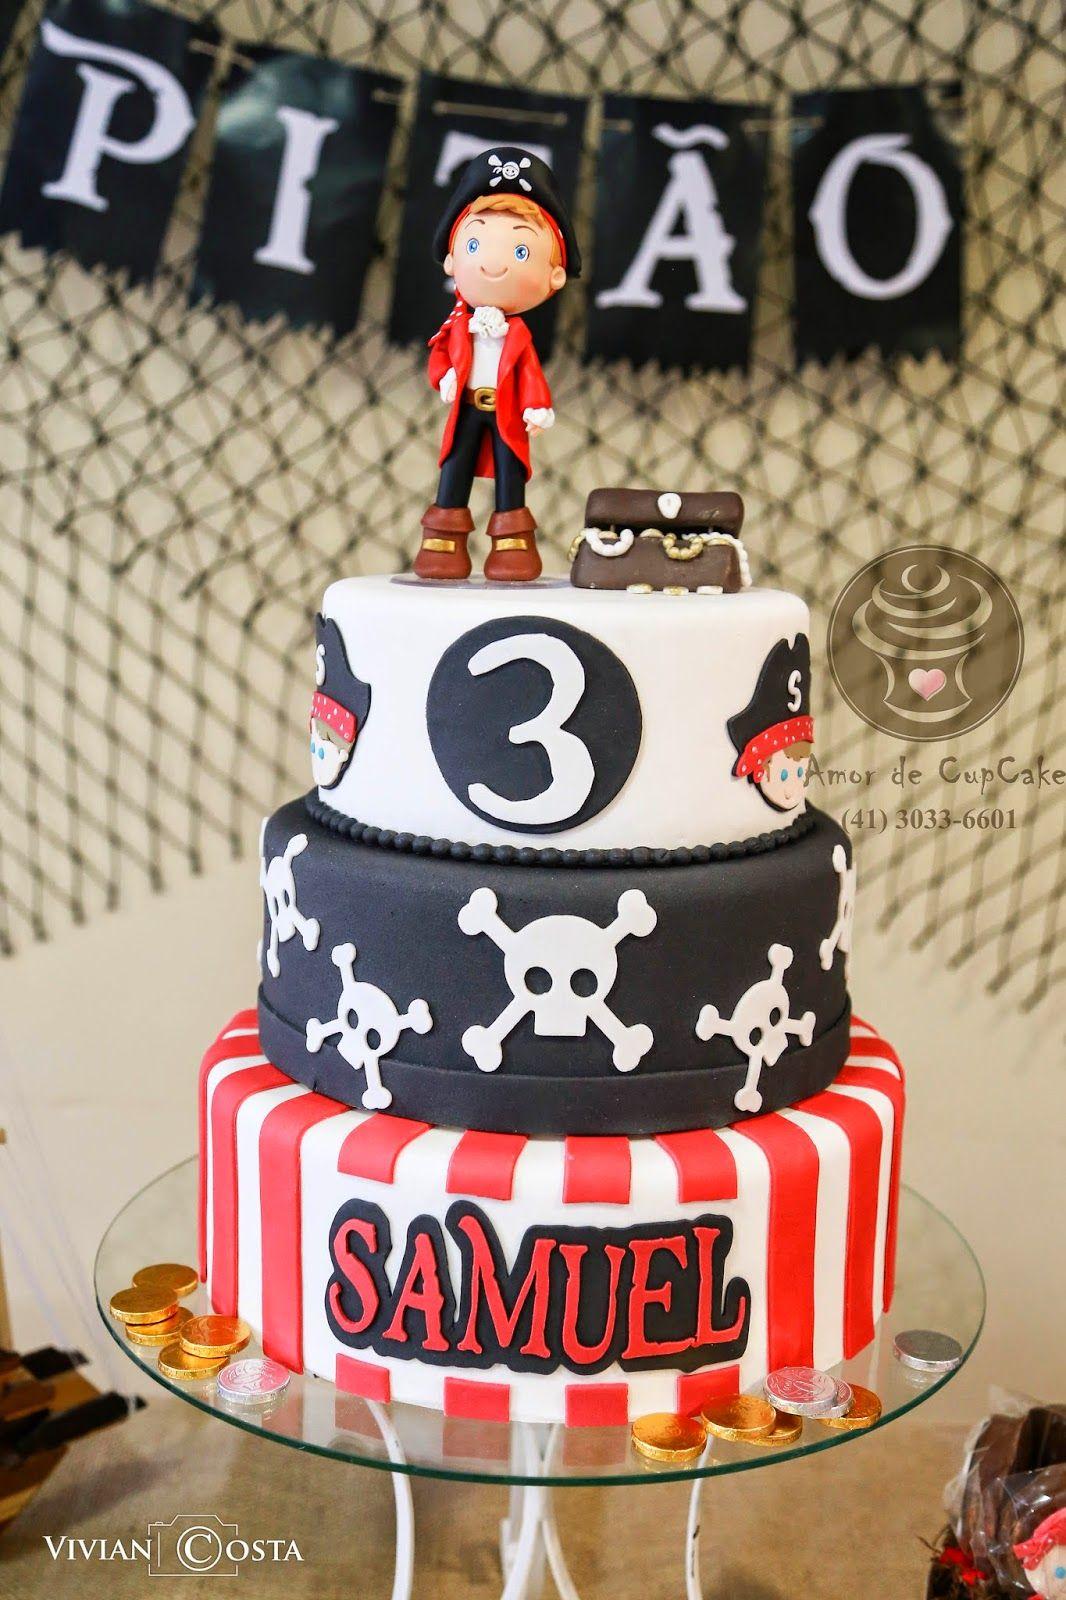 Bolo Pirata - Pirate Cake - Amor de CupCake Curitiba